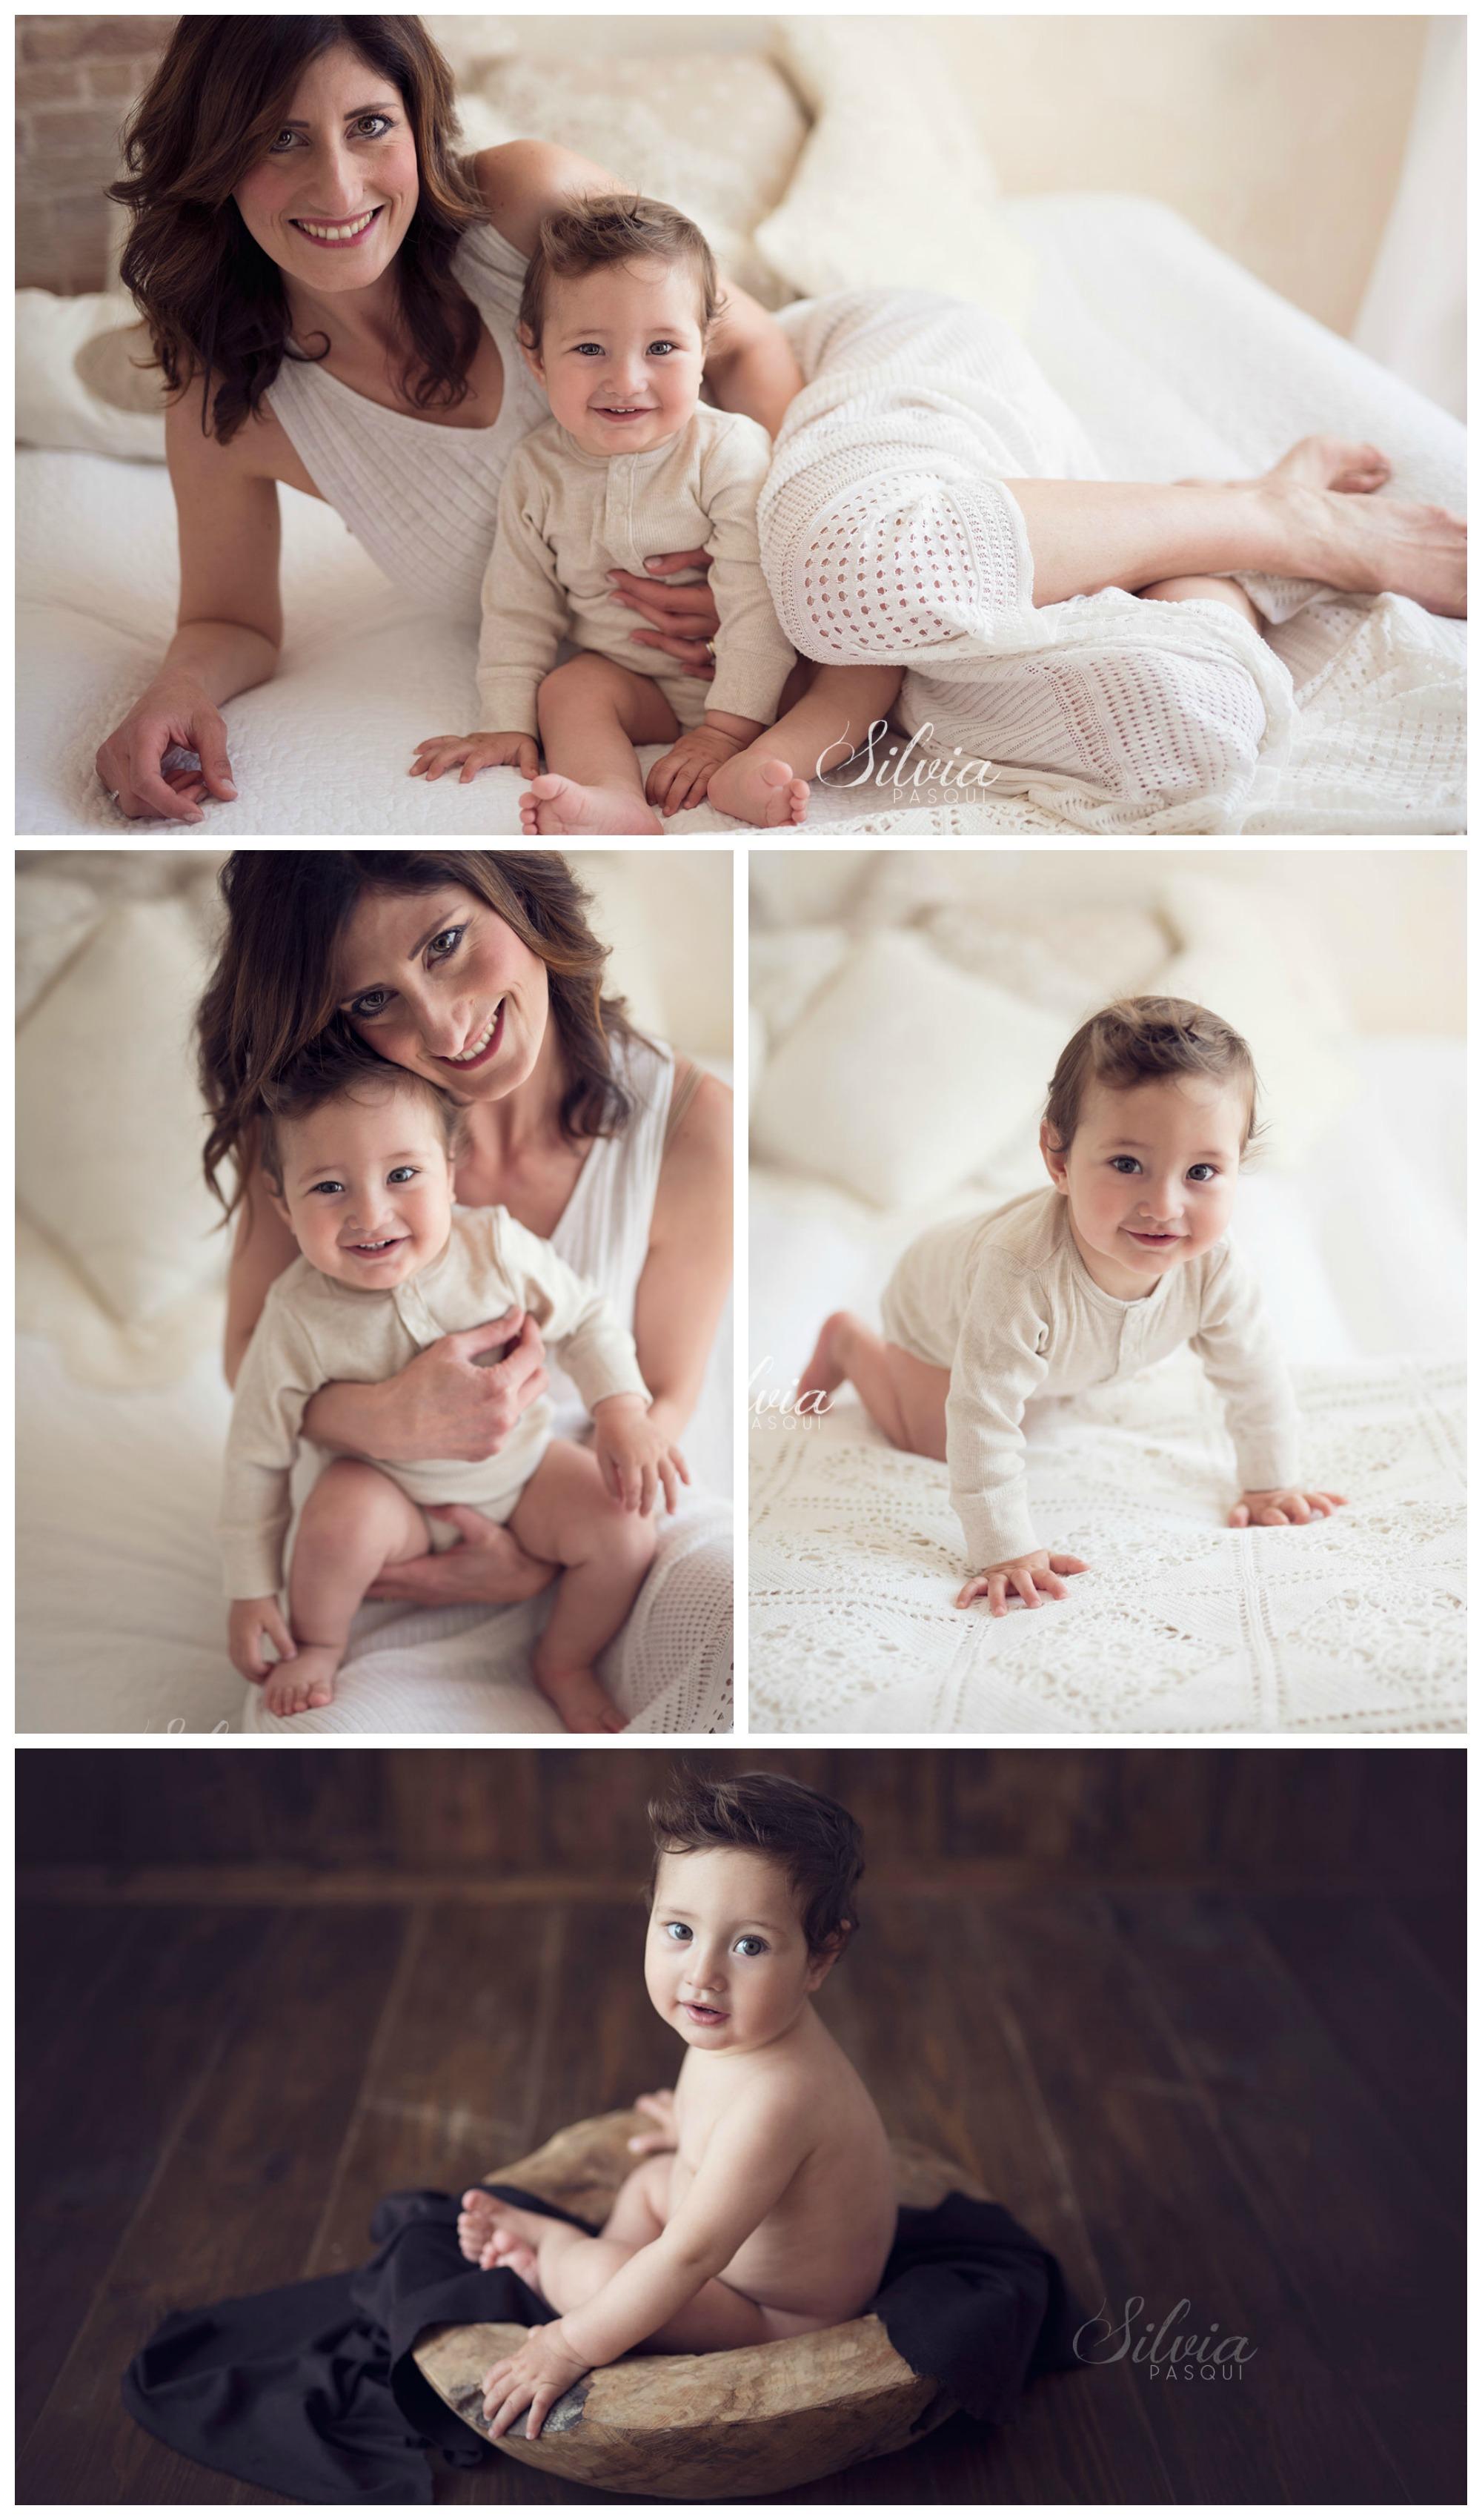 fotografie bambini roma silvia pasqui